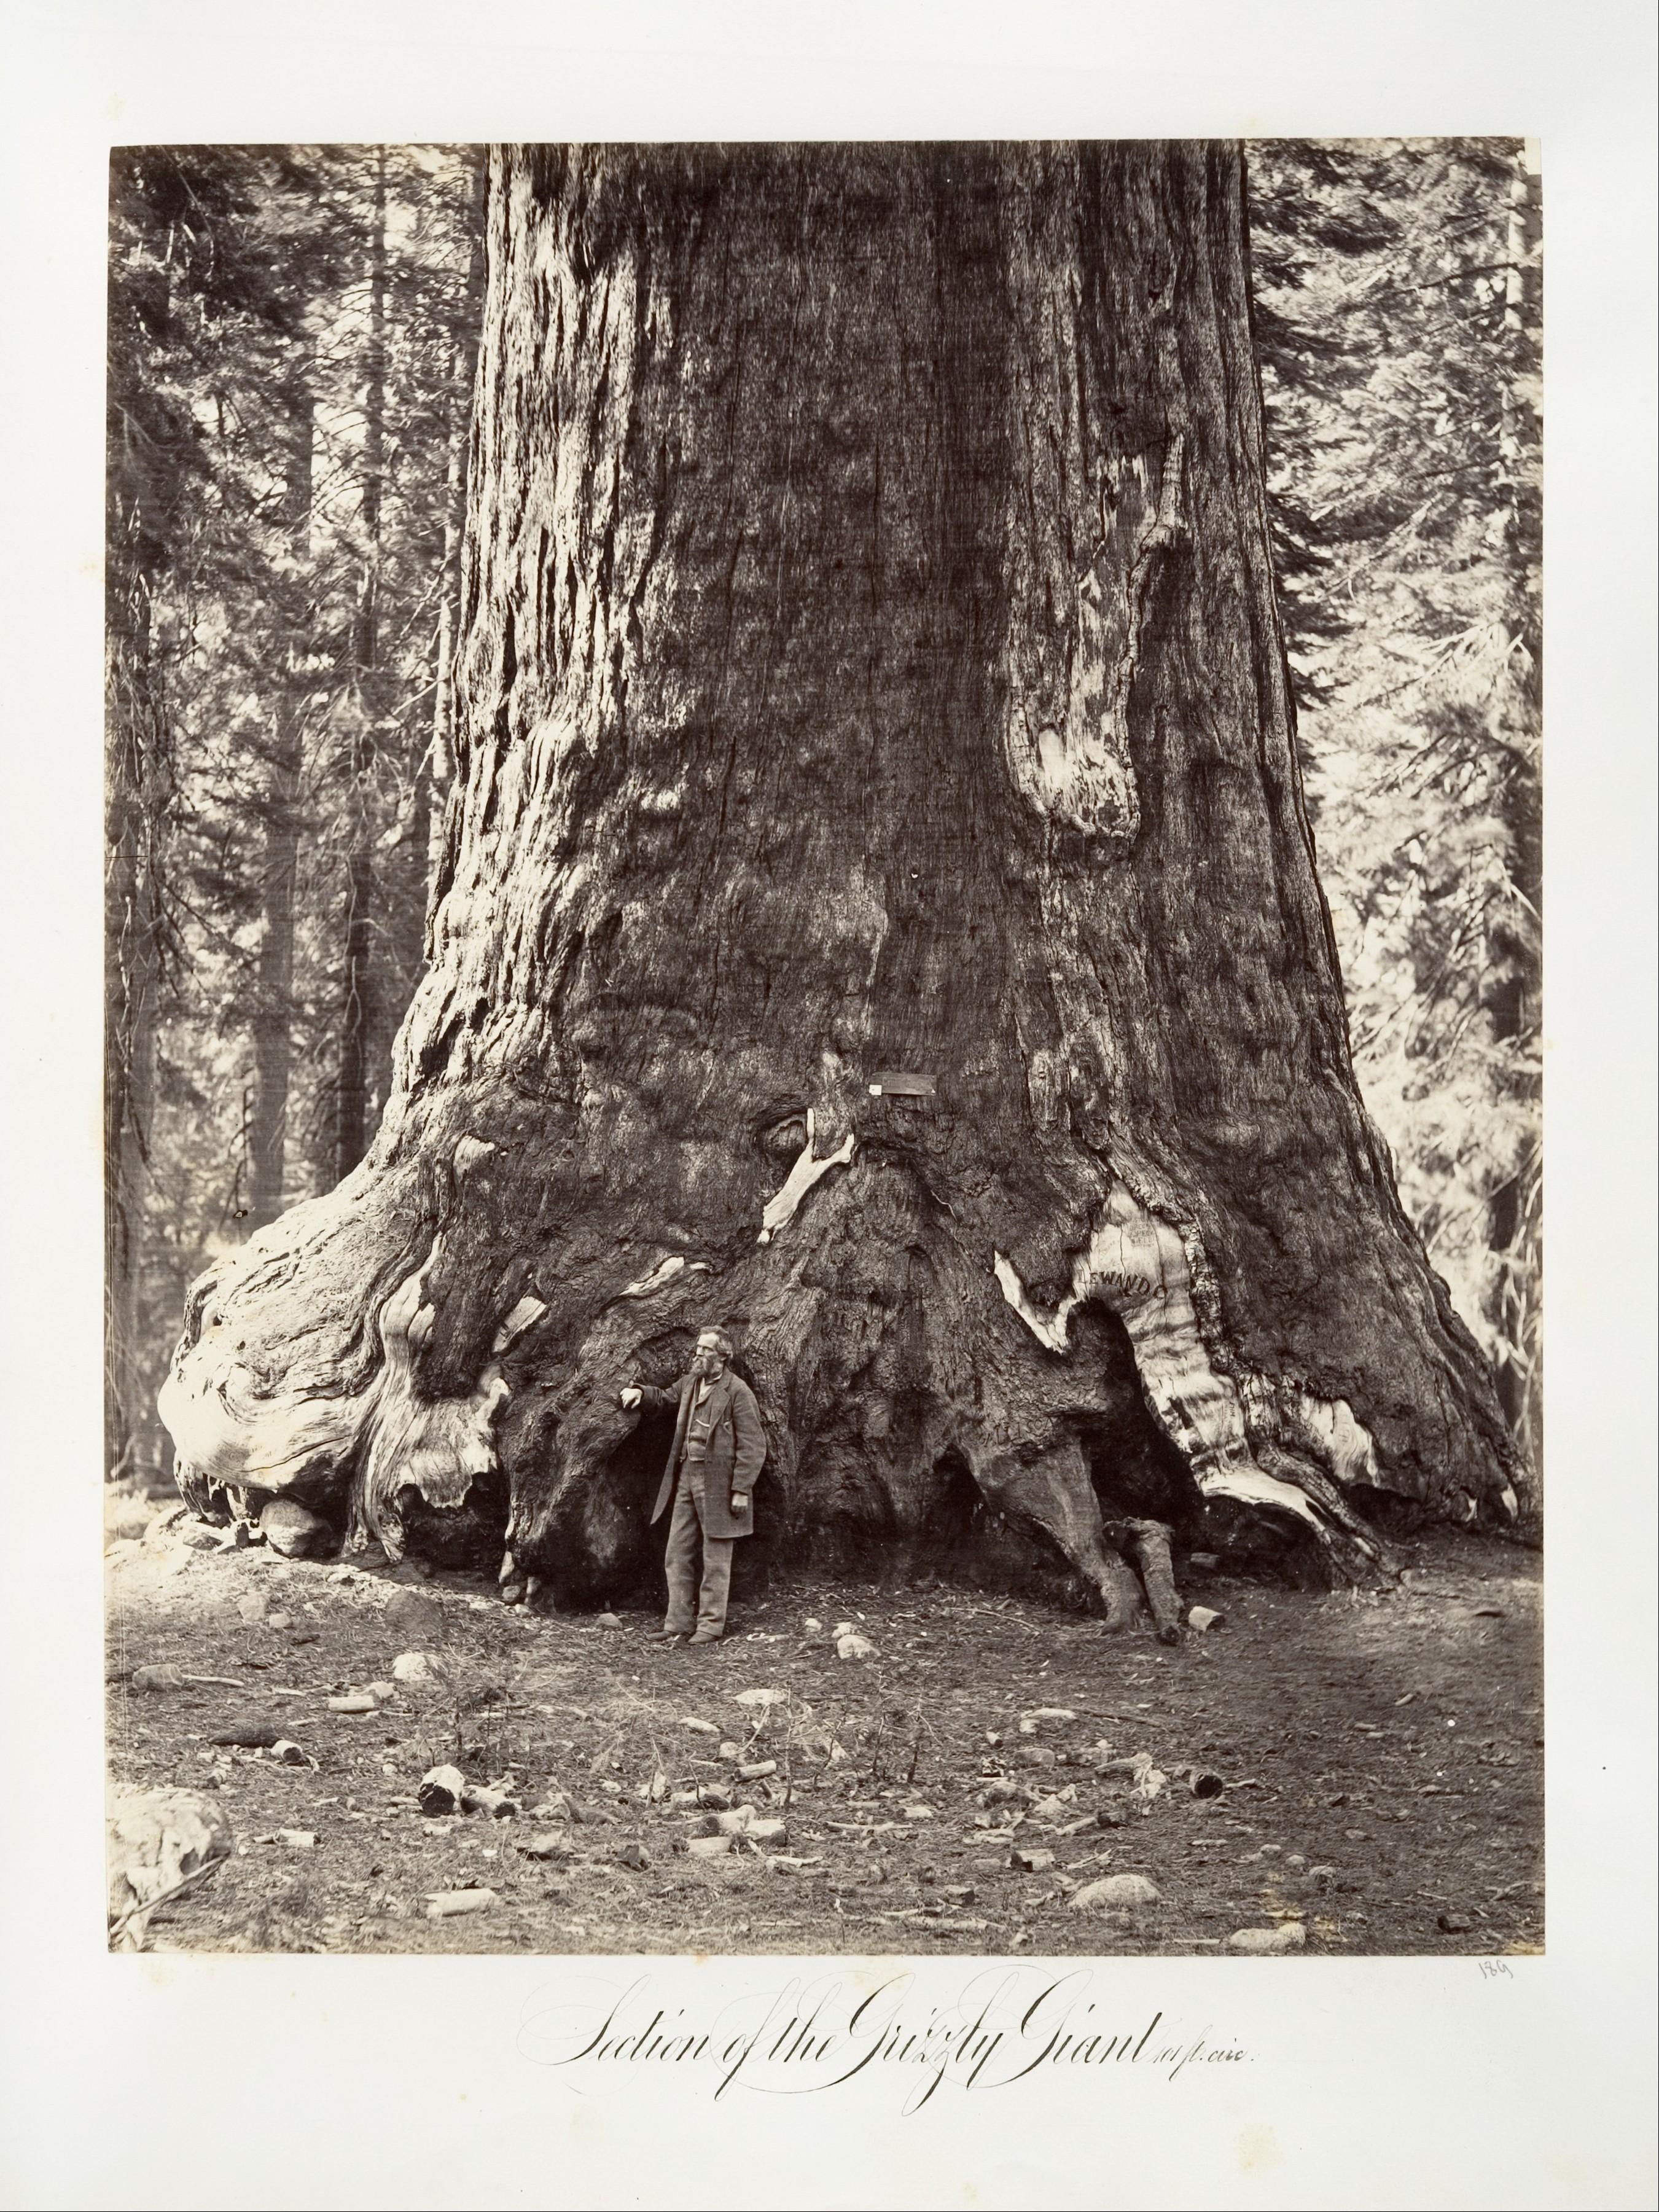 Fotó: Carleton Watkins: Section of the Grizzly Giant, 101 feet circumference, 1865–66, printed ca. 1876 © Carleton Watkins / The Metropolitan Museum of Art